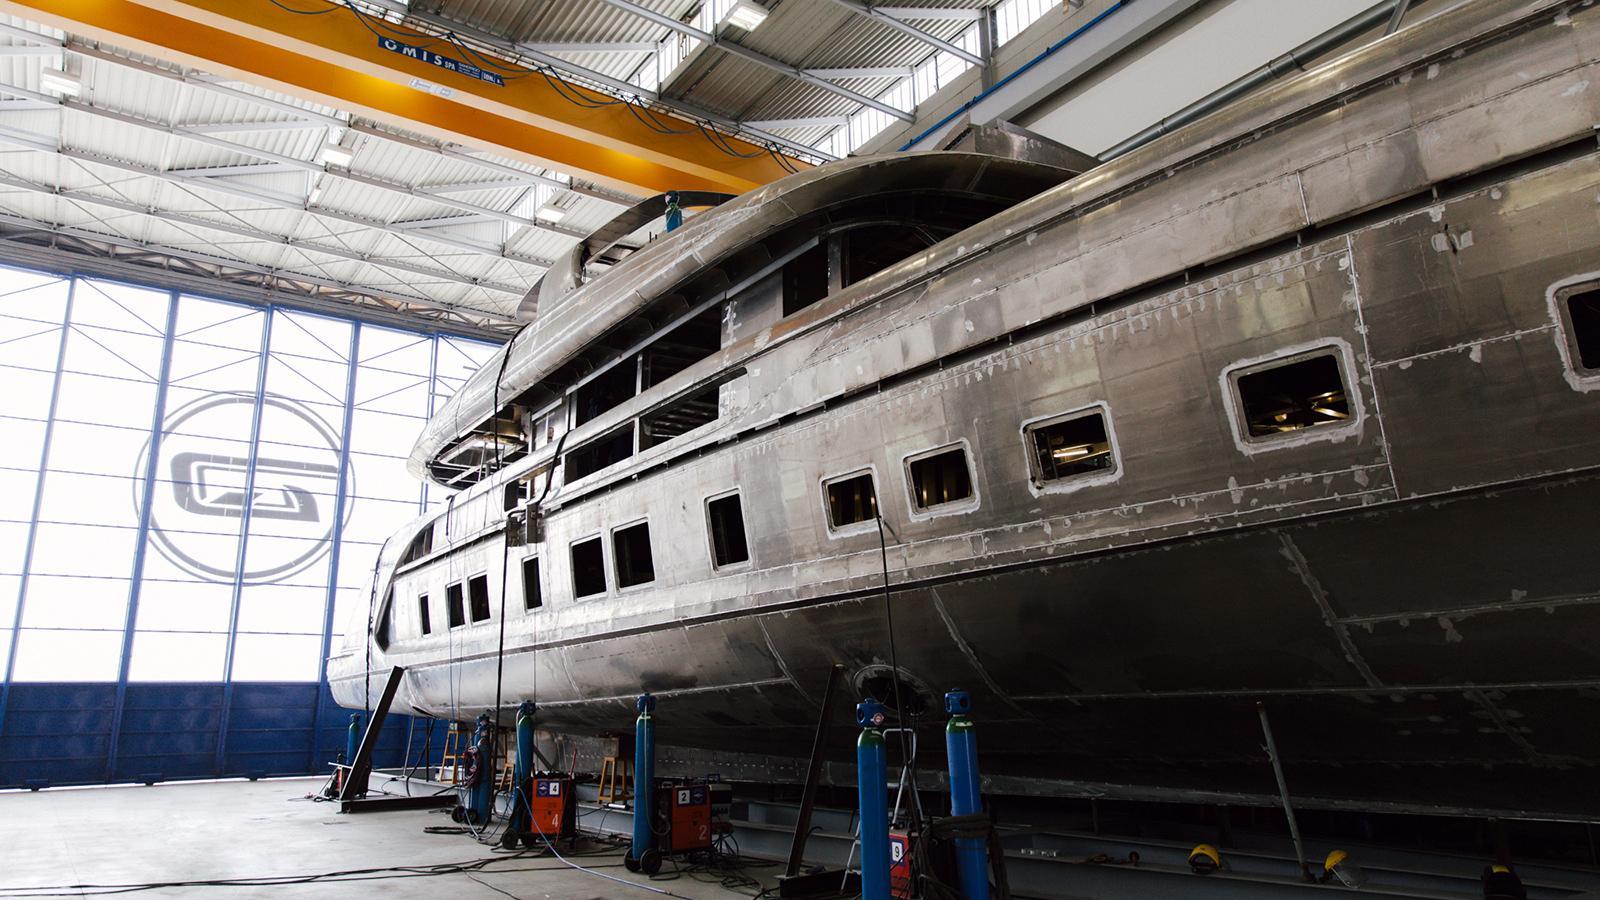 gtt 115 motoryacht dynamiq yachts 35m 2017 under construction